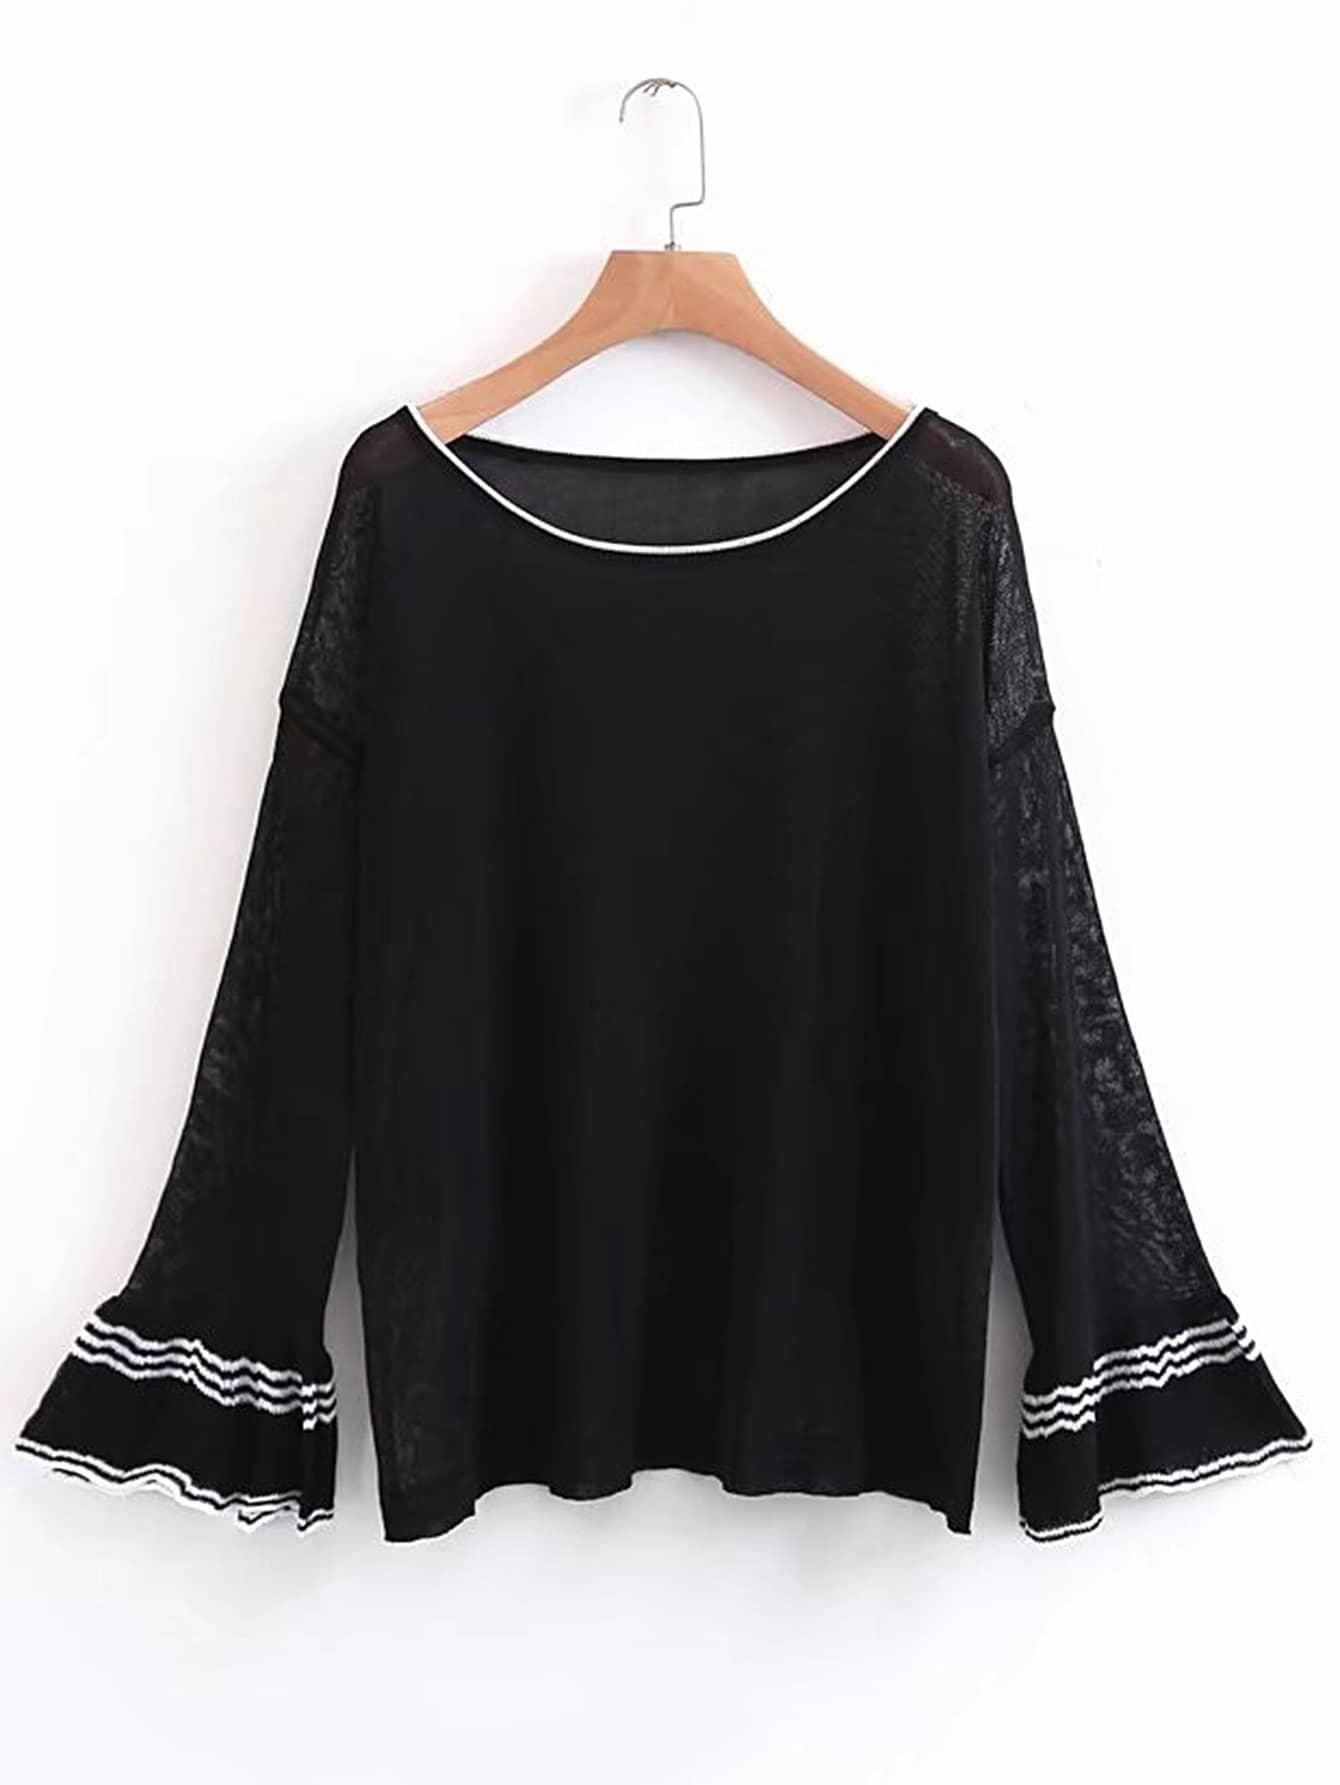 Drop Shoulder Bell Cuff Striped Trim Knitwear sweater170721201